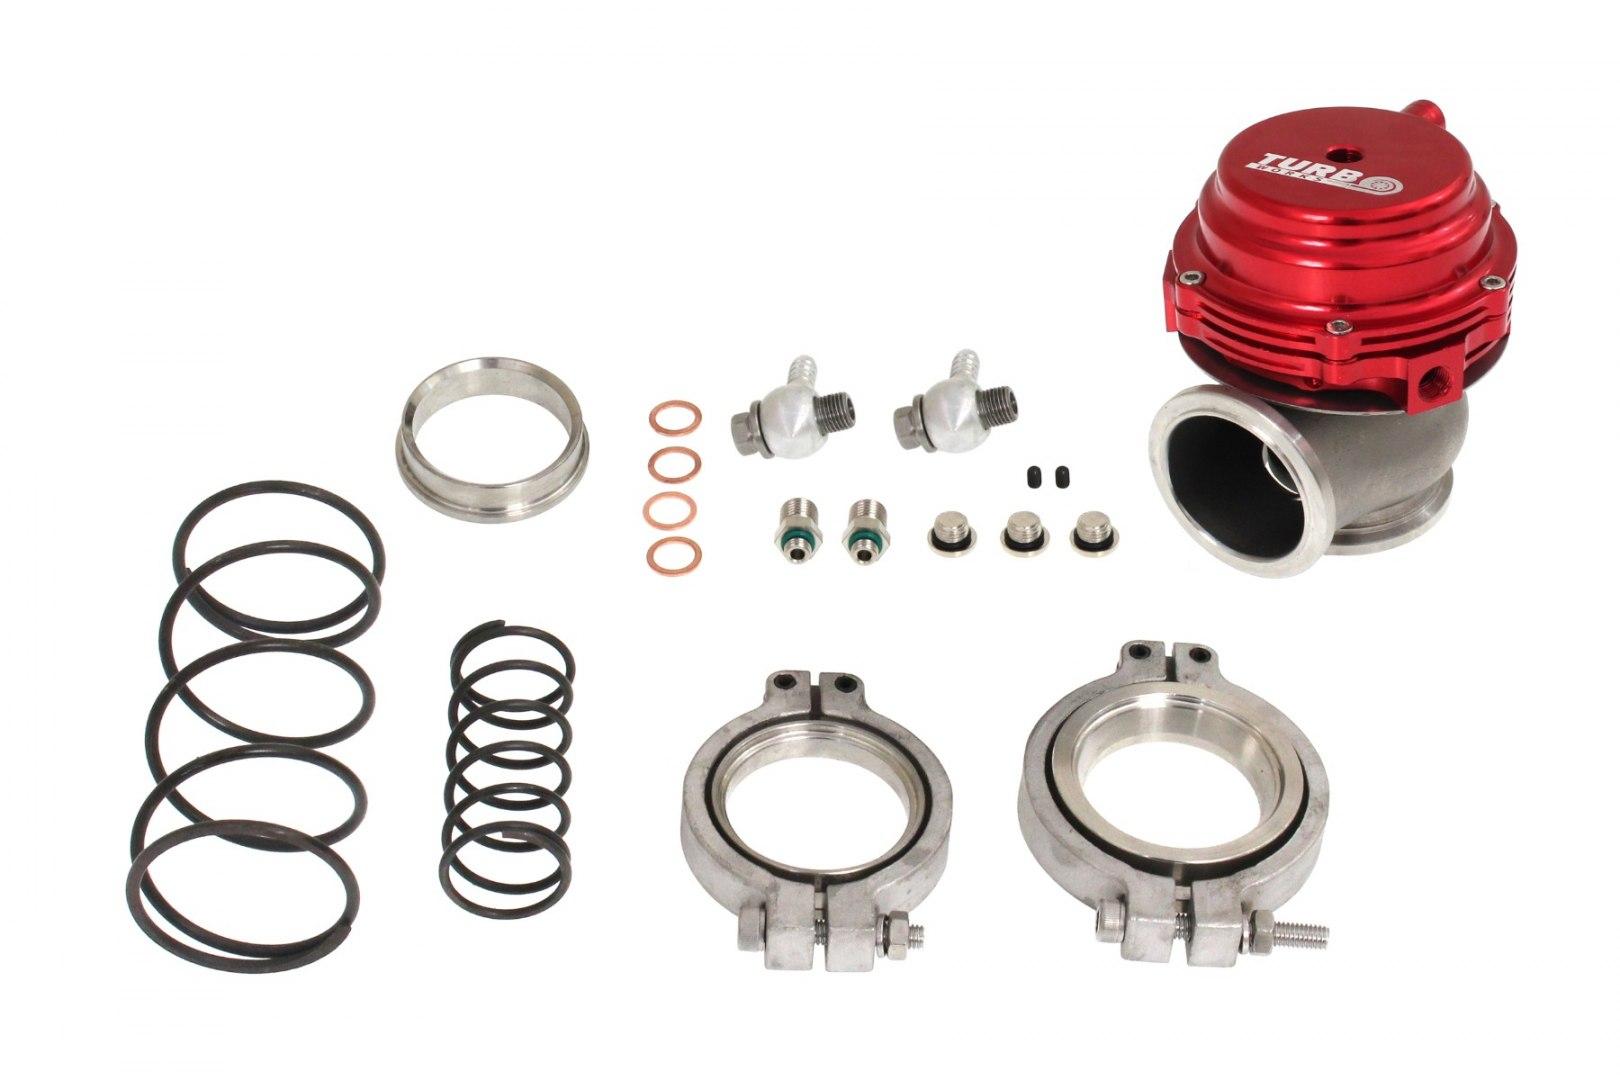 Wastegate zewnętrzny TurboWorks 44mm 1,6 Bar V-Band Red - GRUBYGARAGE - Sklep Tuningowy